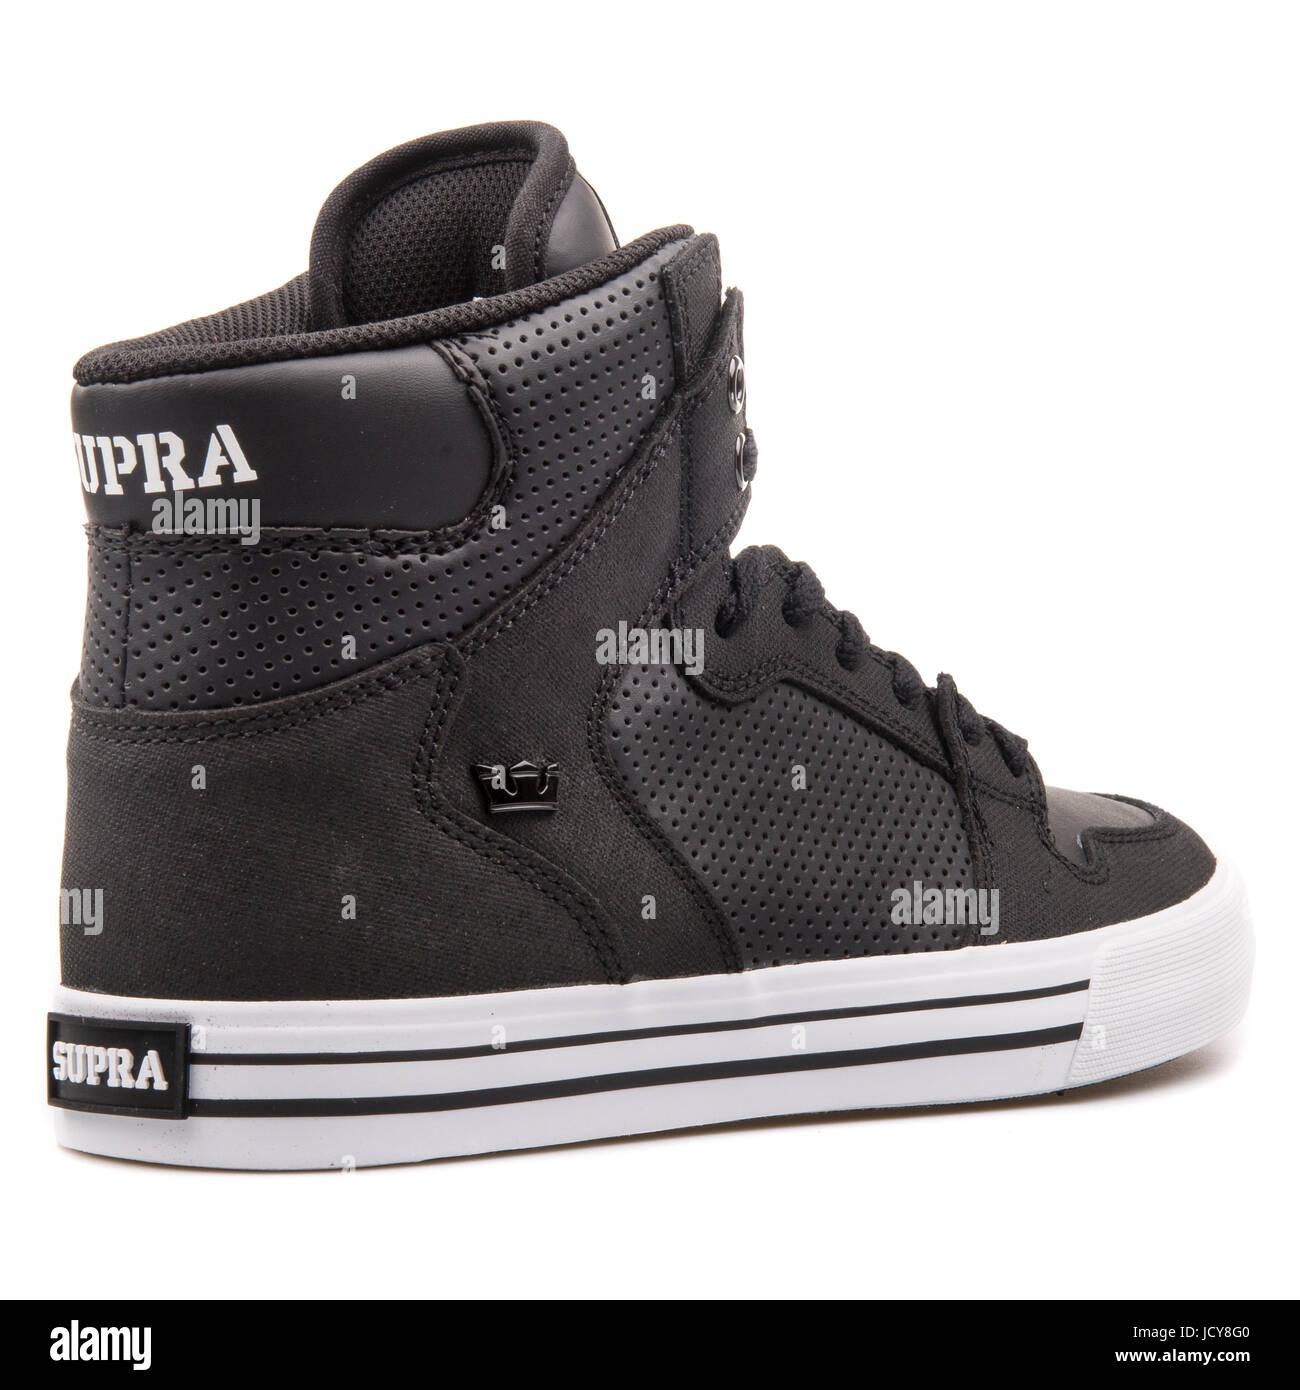 factory price bcf9e 90054 Supra Vaider Black and White Men s Sports Shoes - S28188 - Stock Image